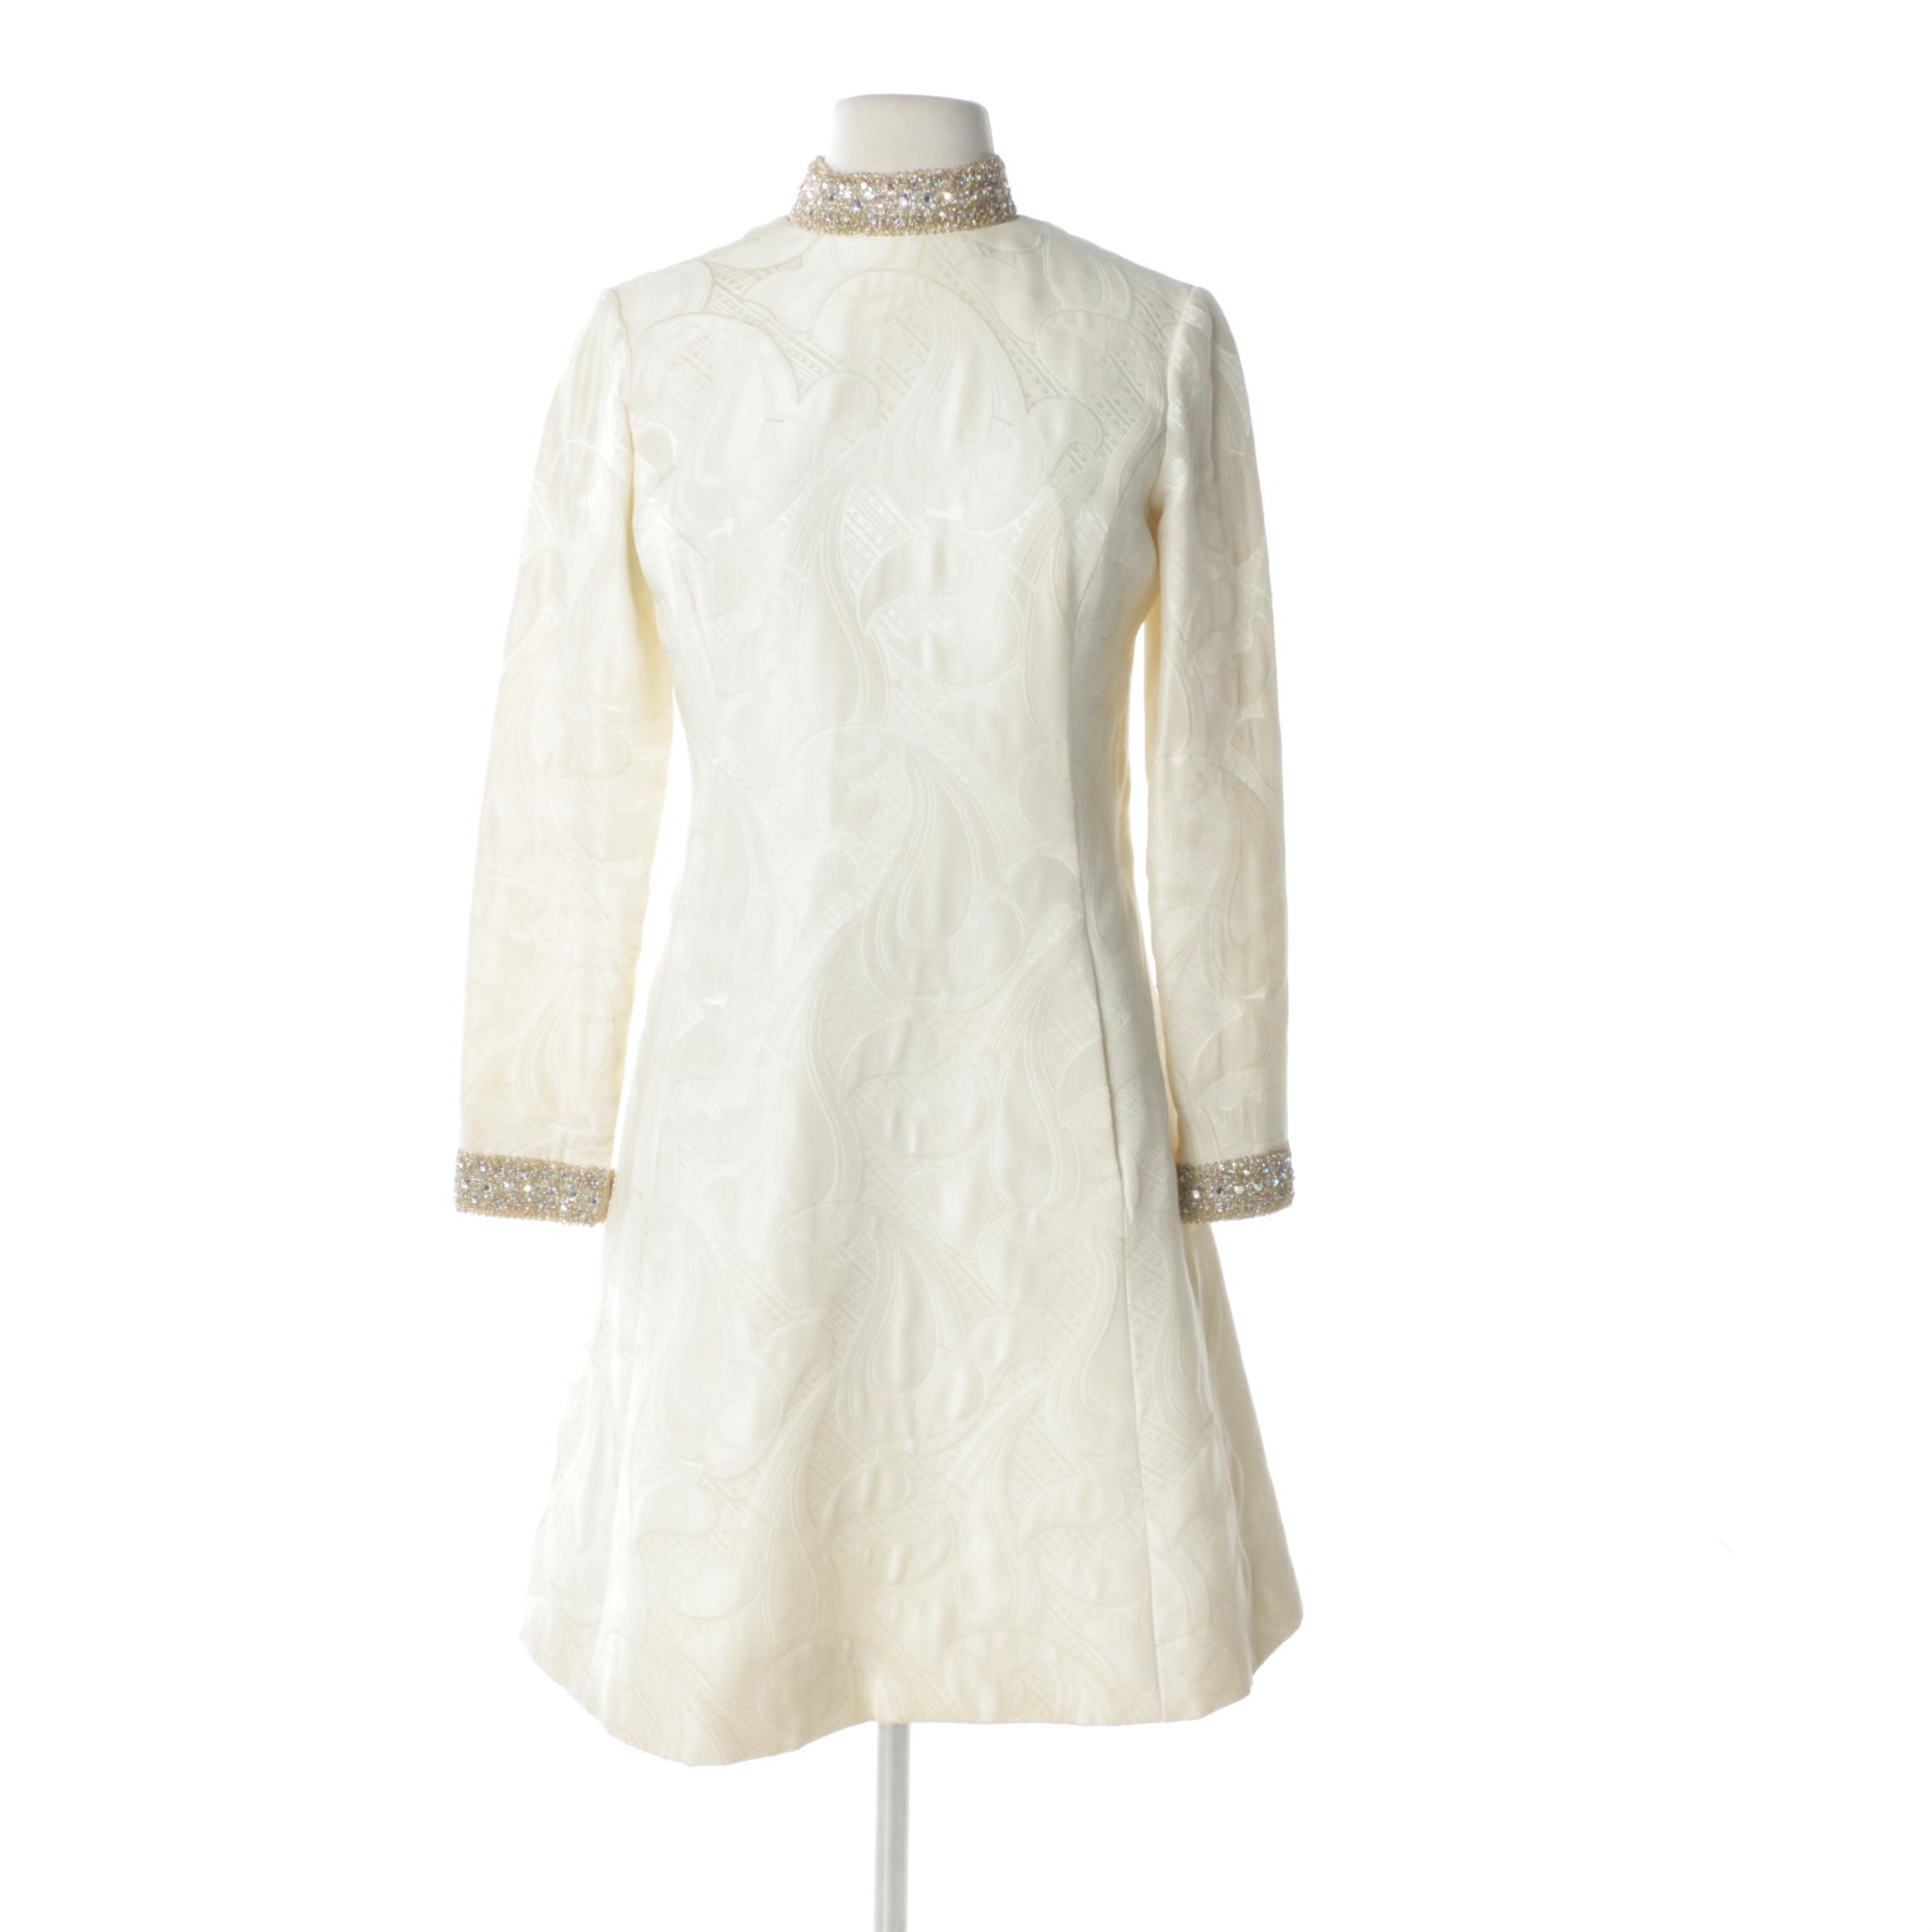 1960s Victor Costa Silk Brocade and Rhinestone Cocktail Dress